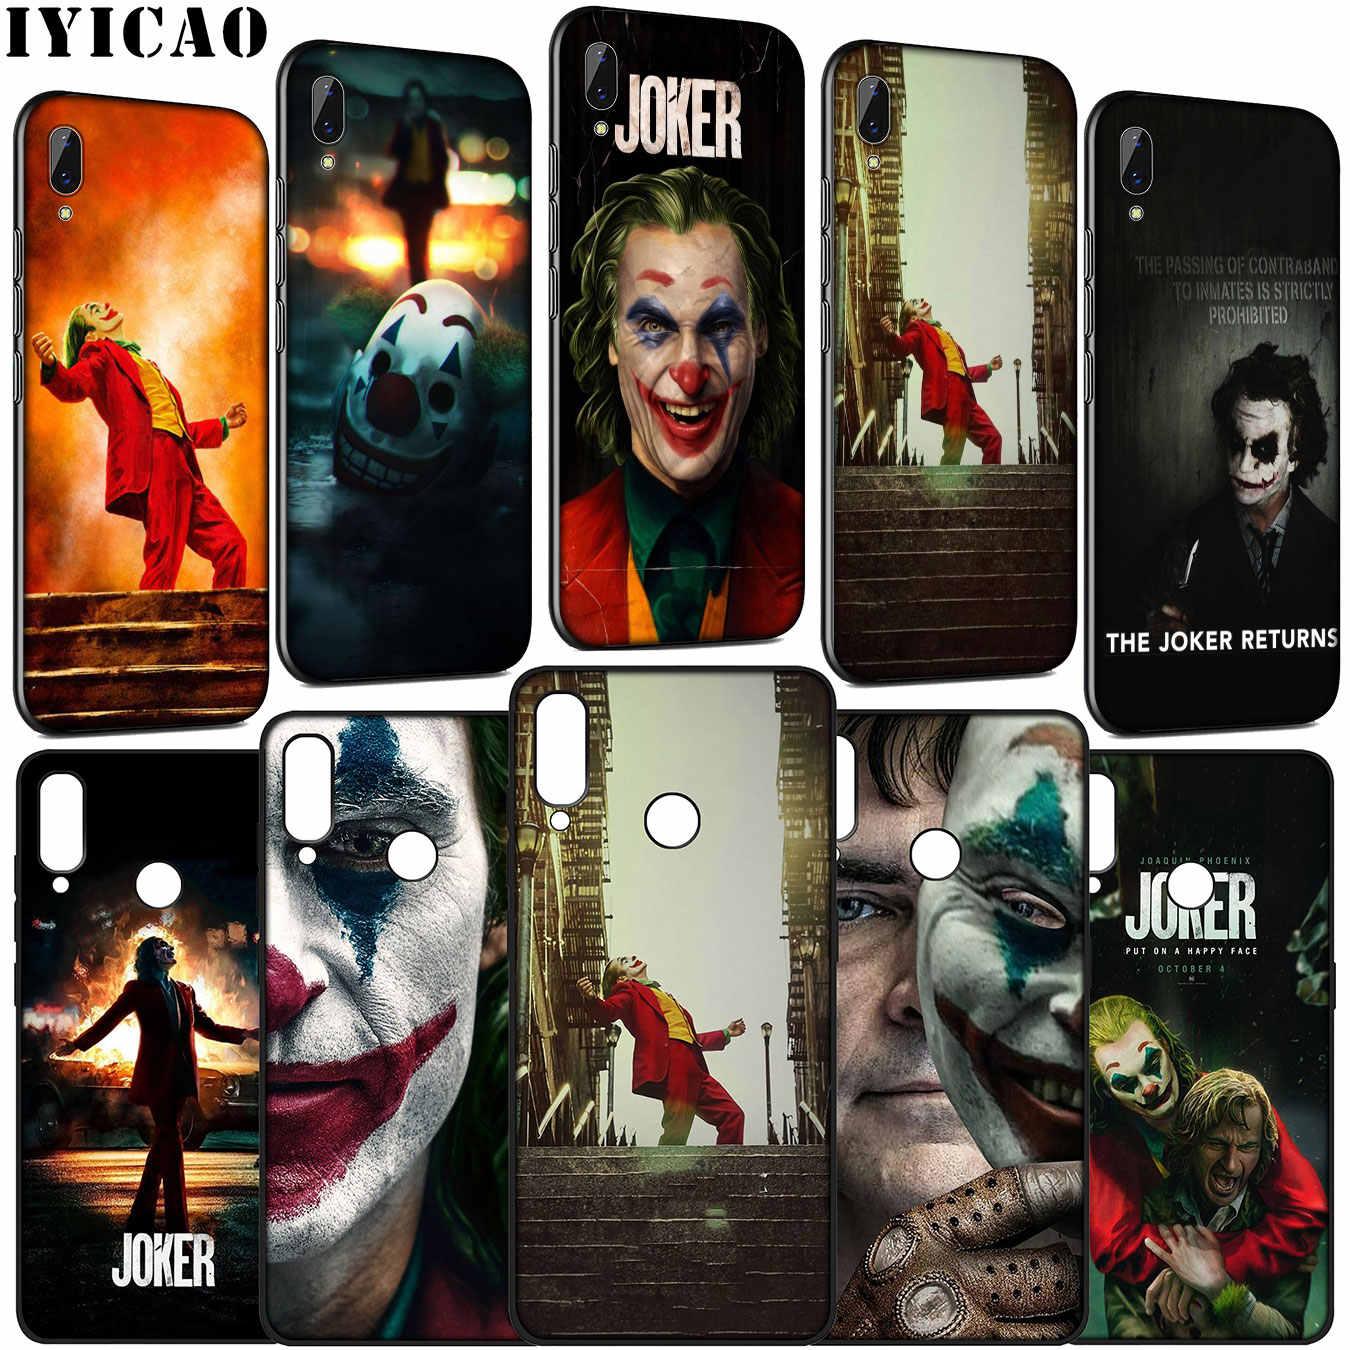 Joaquin Phoenix Phim Joker Mềm Mại Ốp Lưng Điện Thoại Huawei Y9 Y7 Y6 Prime 2019 2018 Honor 20 10 9 9X 8C 8X8 Lite 7C 7X 7A Pro